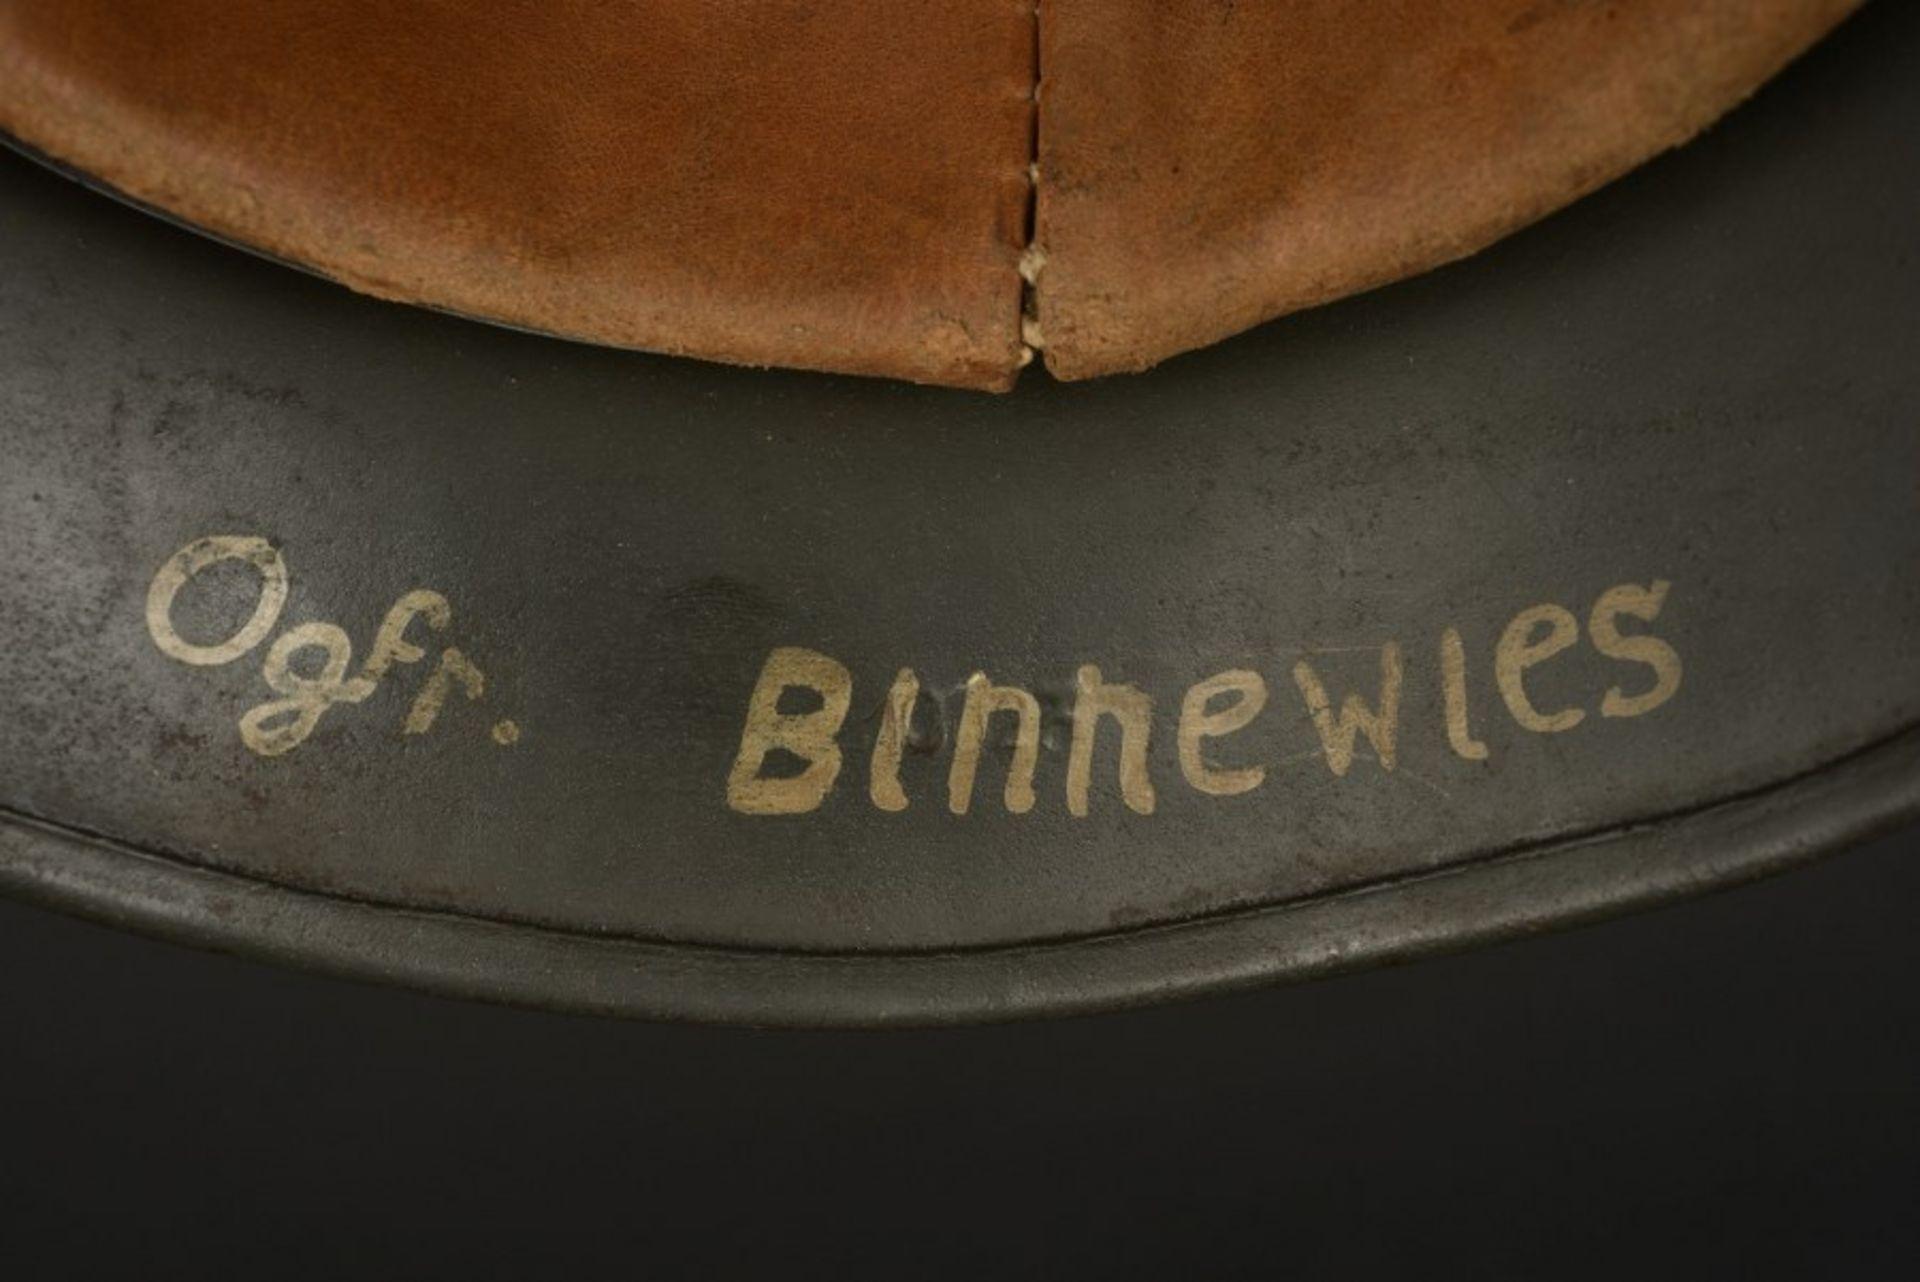 Casque camouflé de l'Obergefreiter Binnewies. Camouflaged helmet belonging to Obergefreiter - Bild 4 aus 4